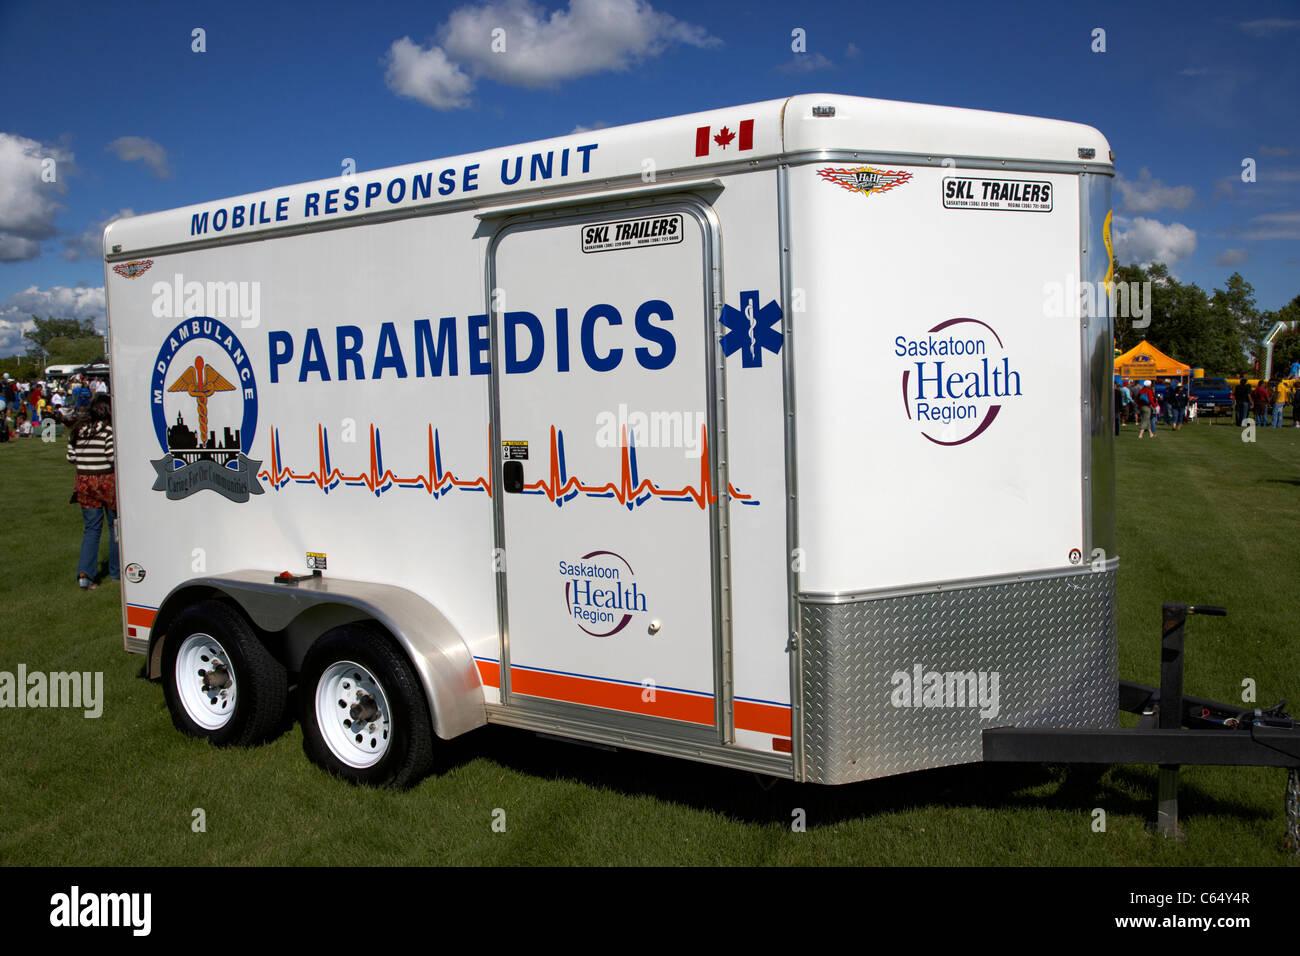 Saskatoon health region mobile response unit trailer paramedics Saskatchewan Canada - Stock Image